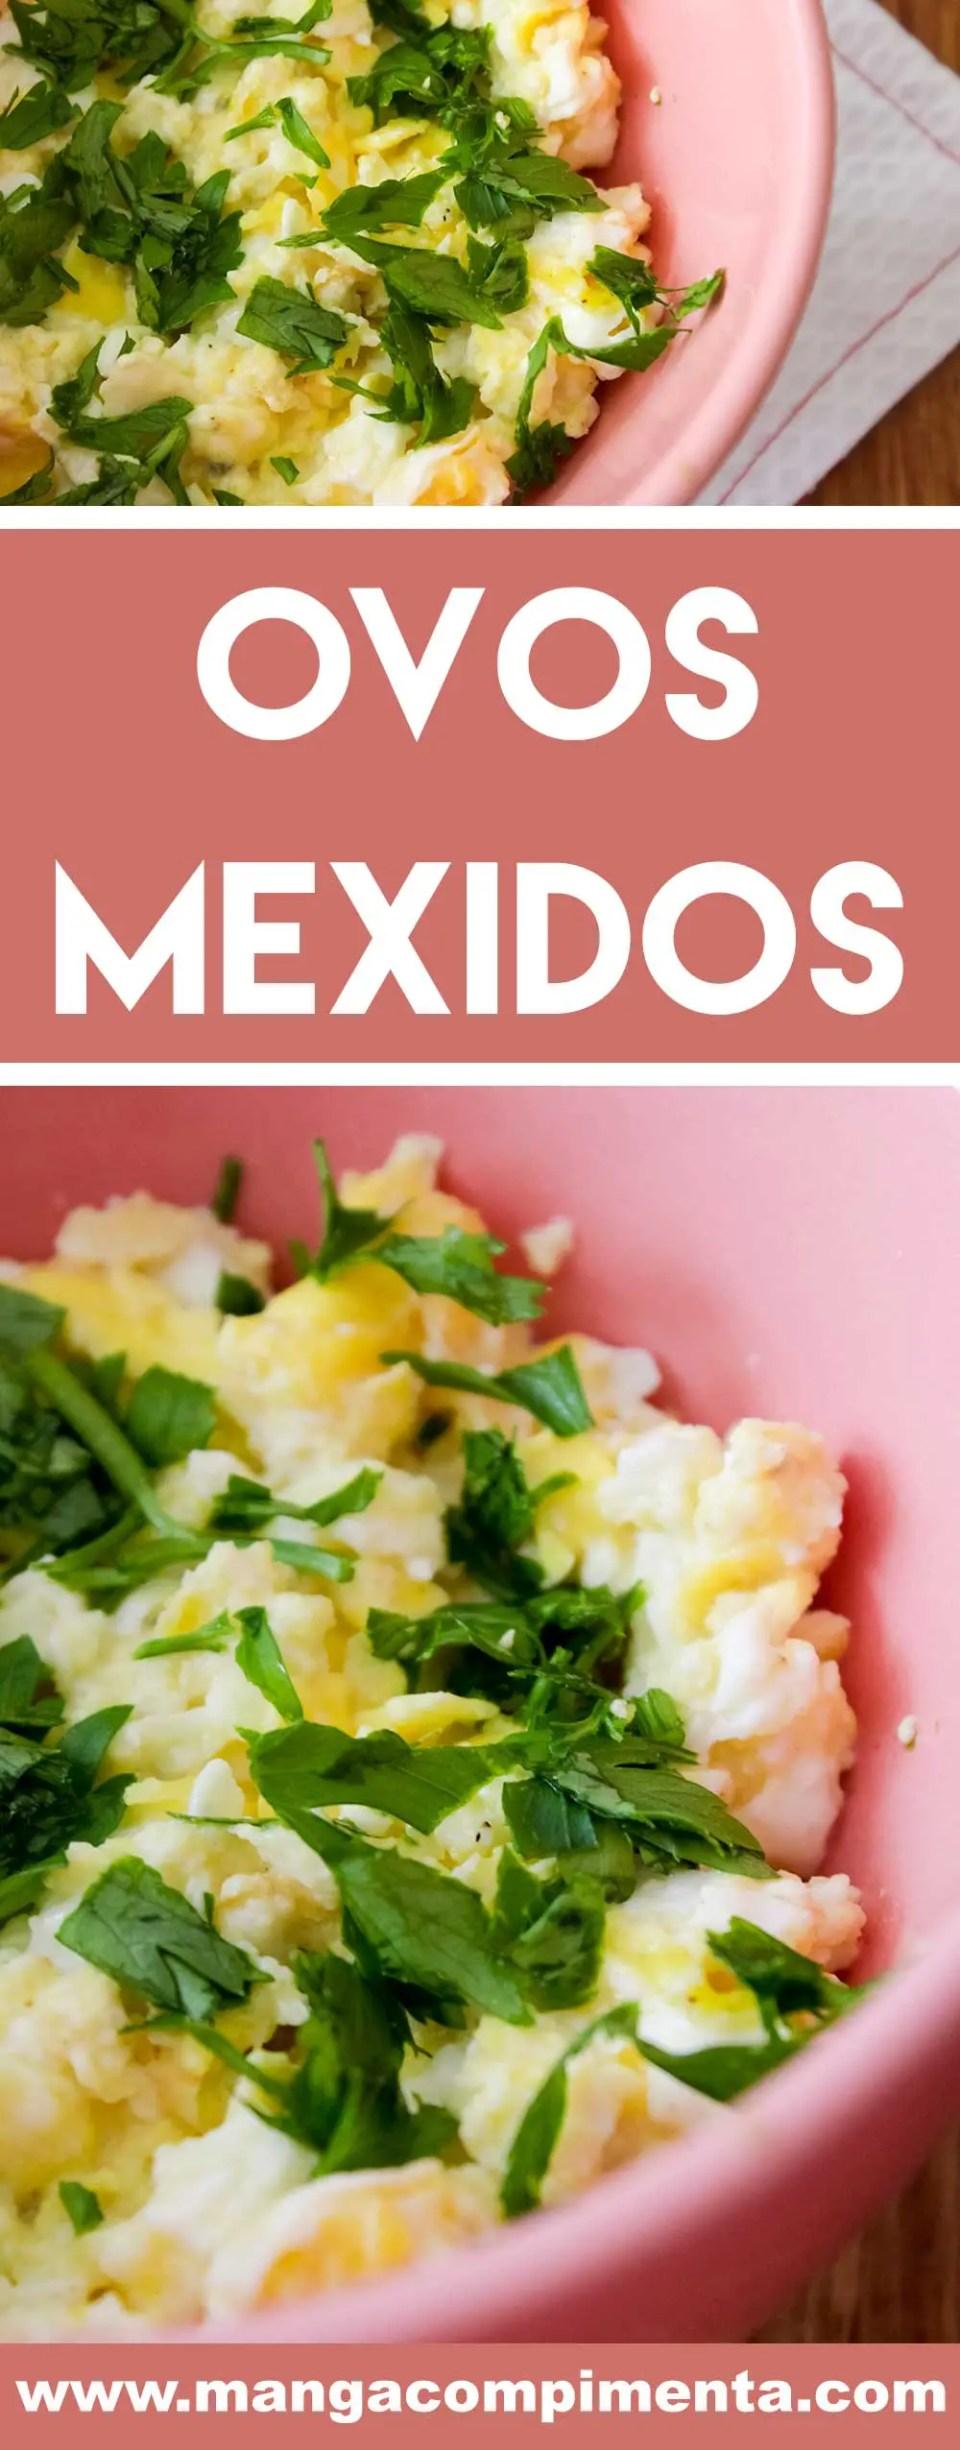 Receita de Ovos Mexidos - perfeito para o café da manhã ou para servir no lanche.